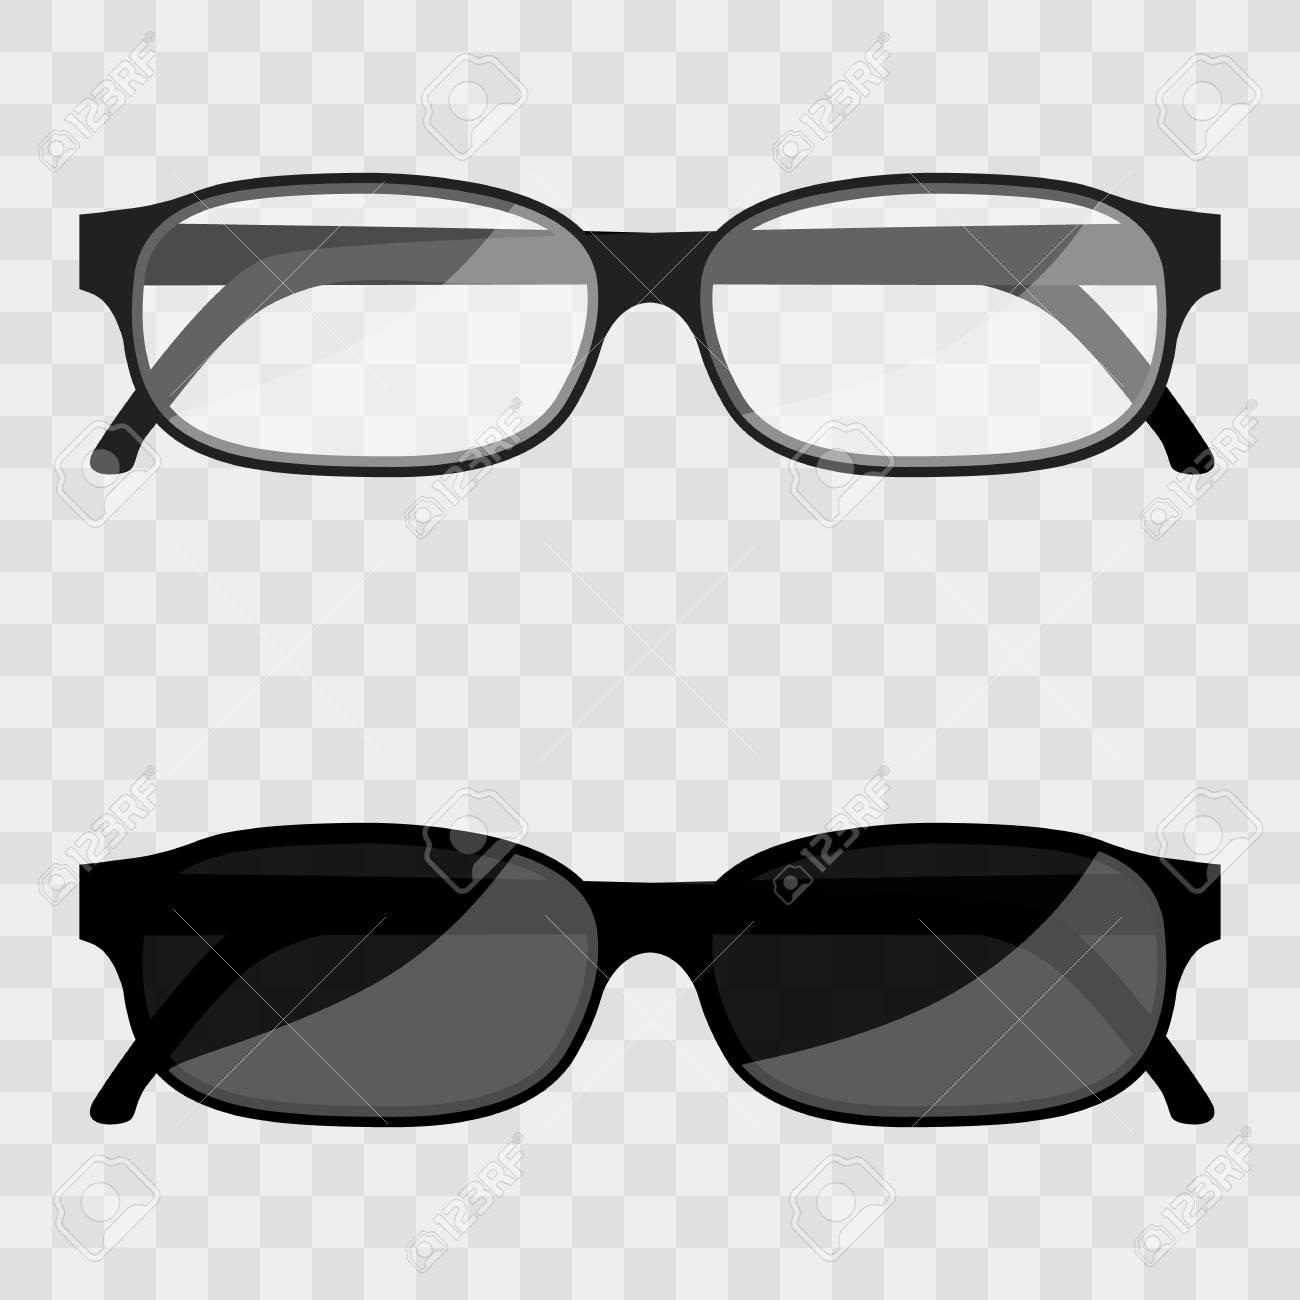 Geek Clipart Eyewear - Glasses Geek Icon - Png Download (#953472) -  PinClipart